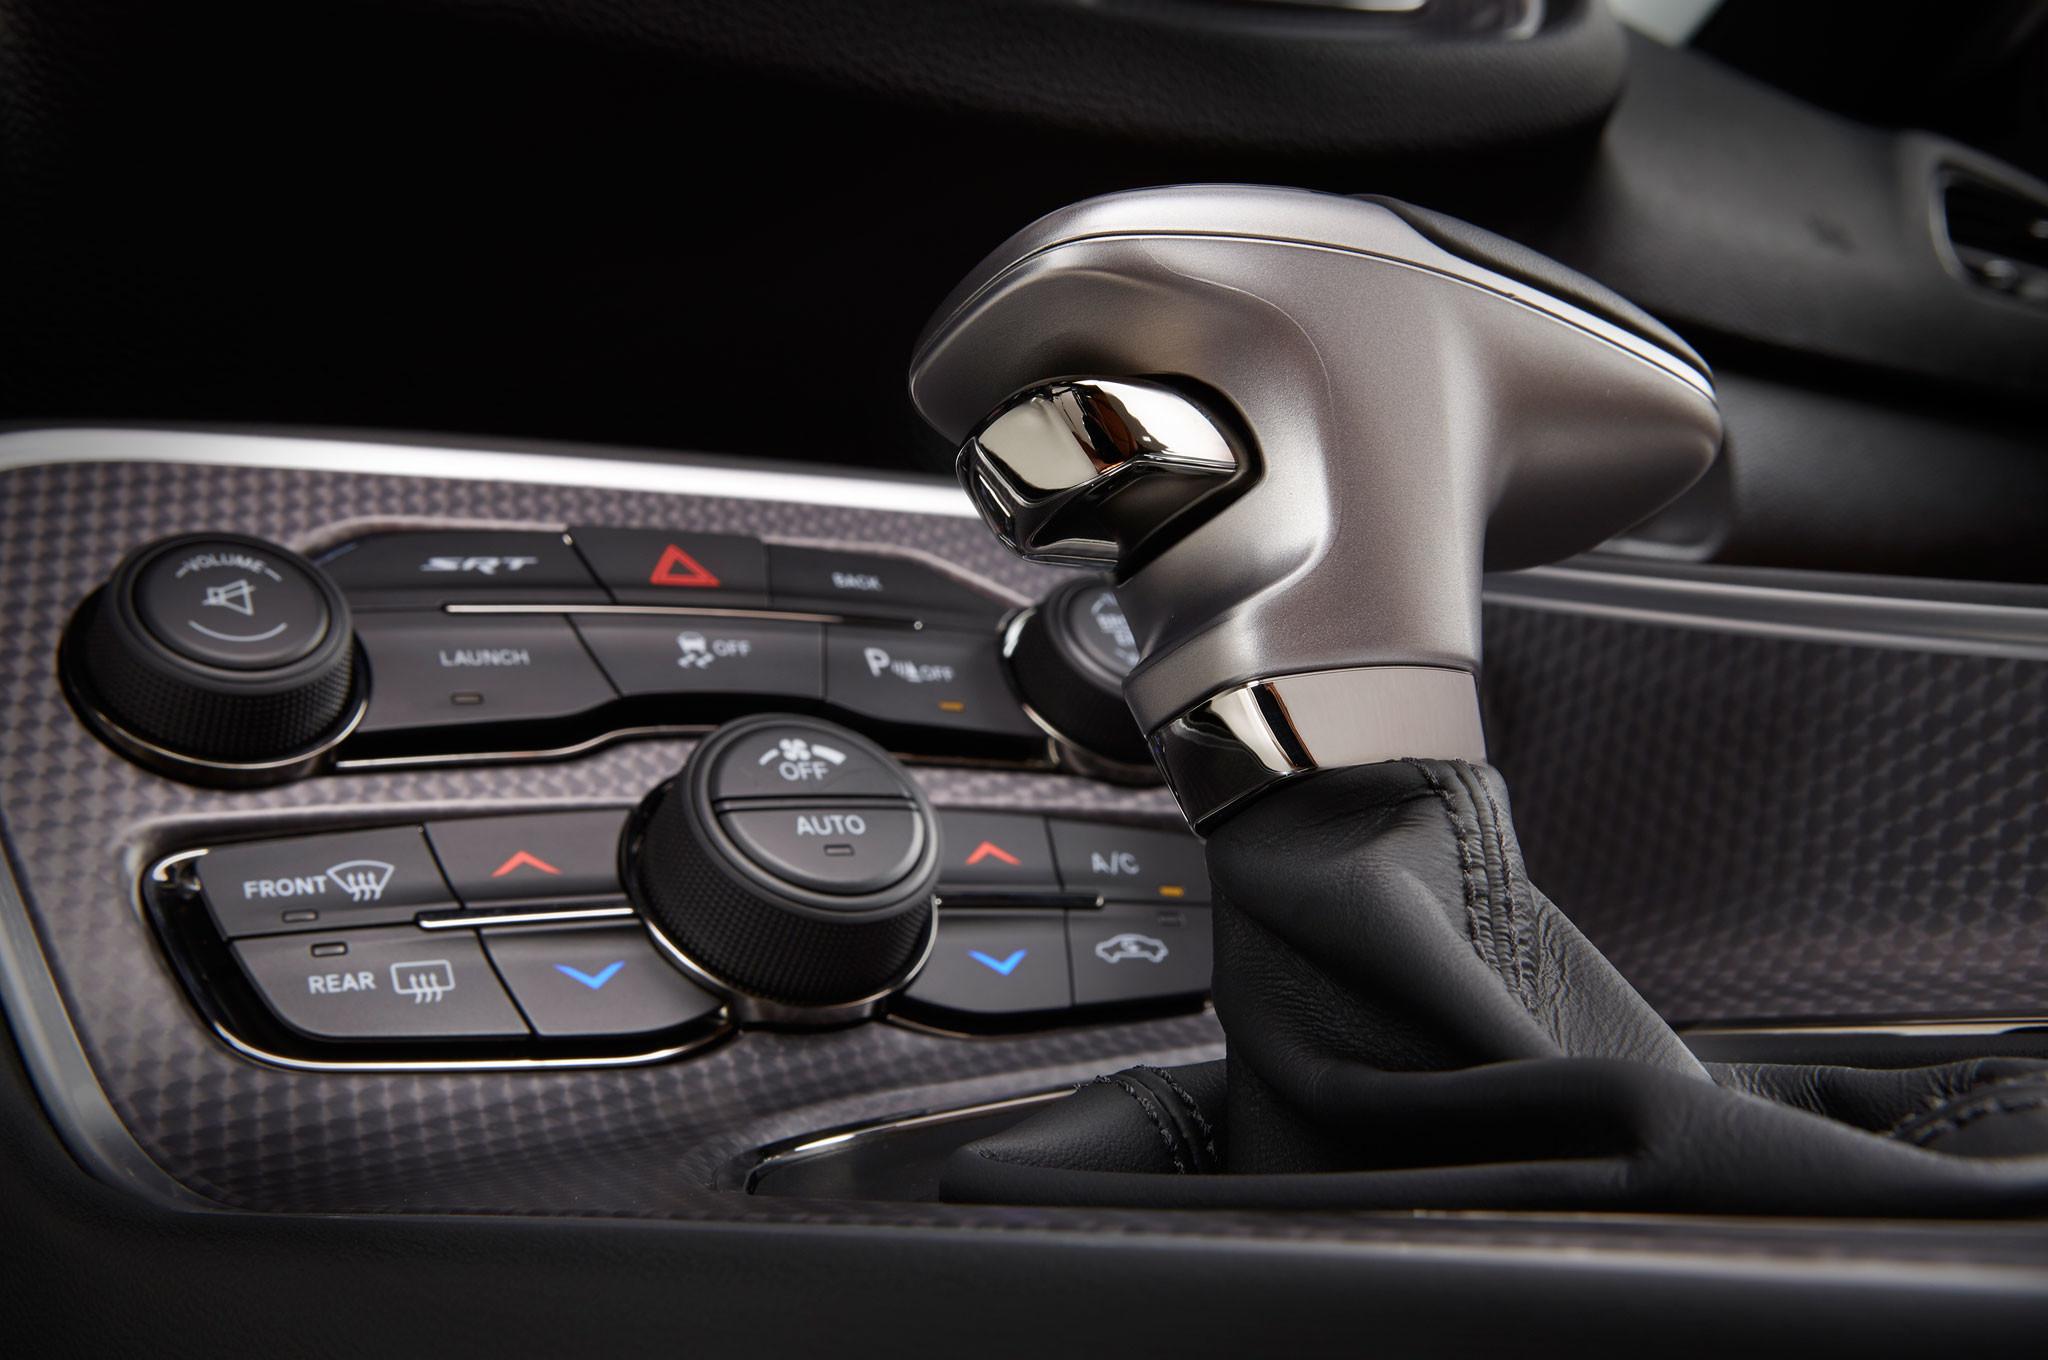 2015 Dodge Challenger Srt Hellcat Interior Shifter Stalk